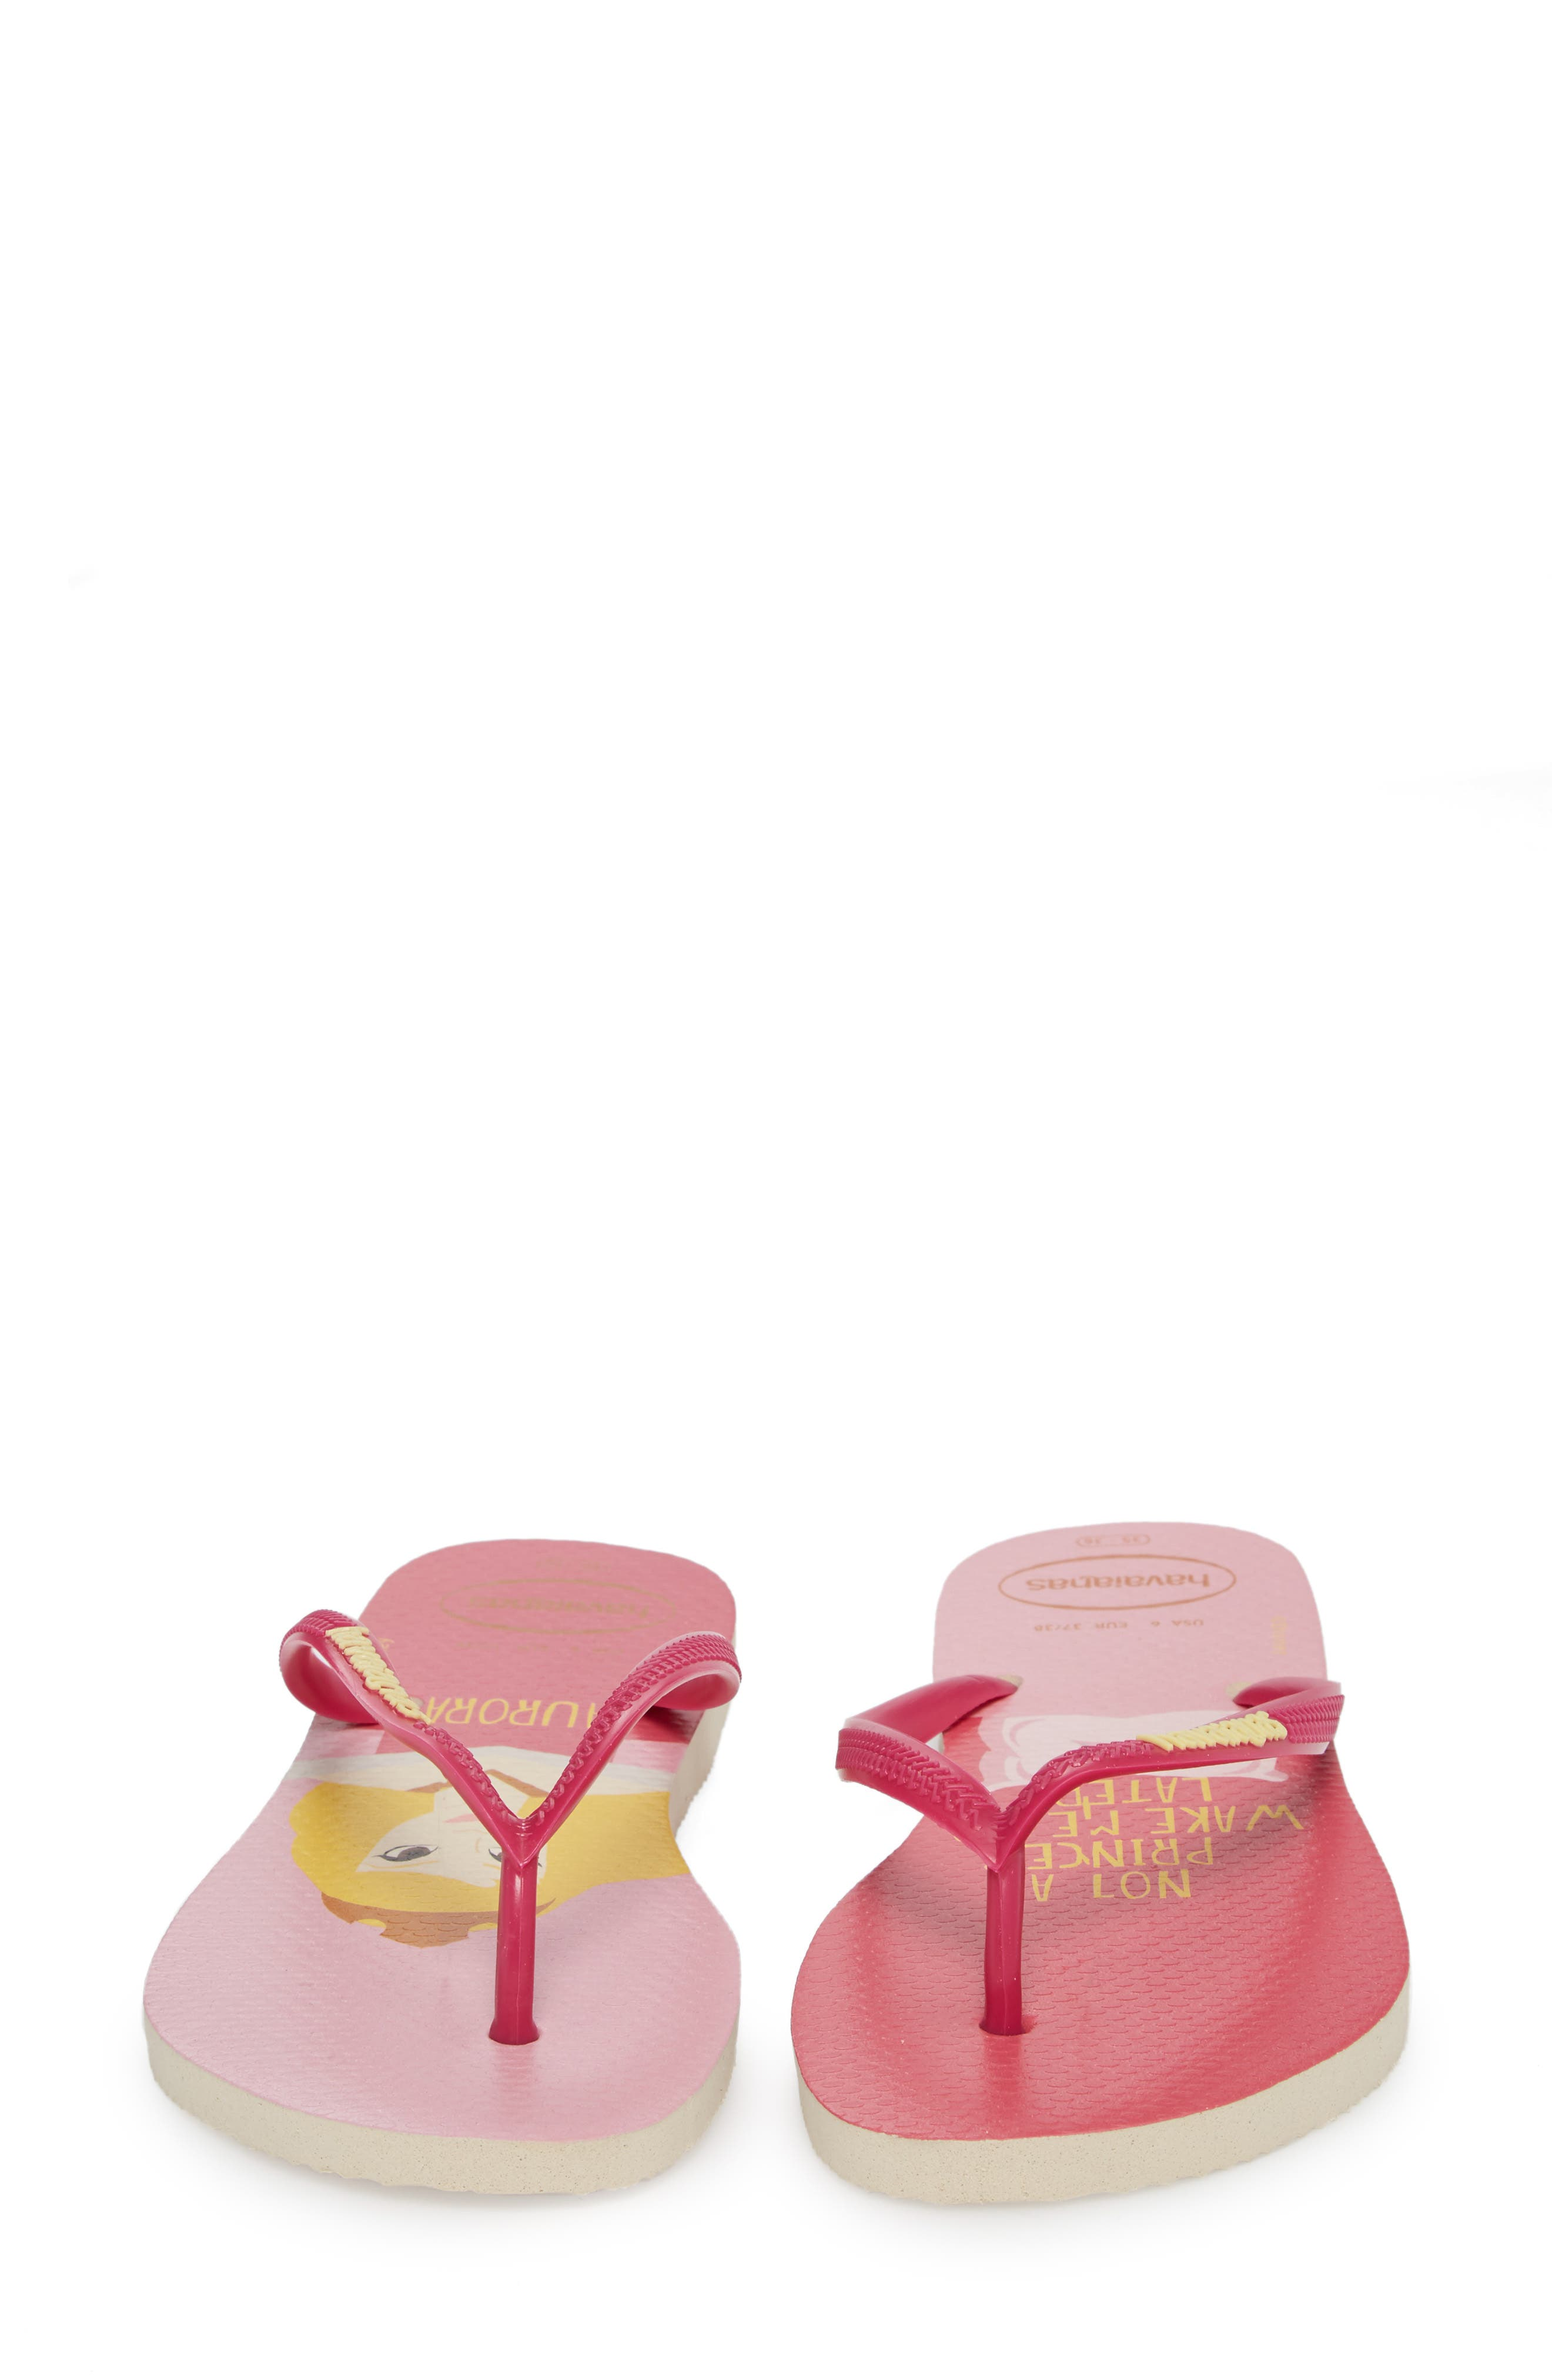 Havaiana Slim - Disney Princess Flip Flop,                             Alternate thumbnail 4, color,                             Beige/ Pink